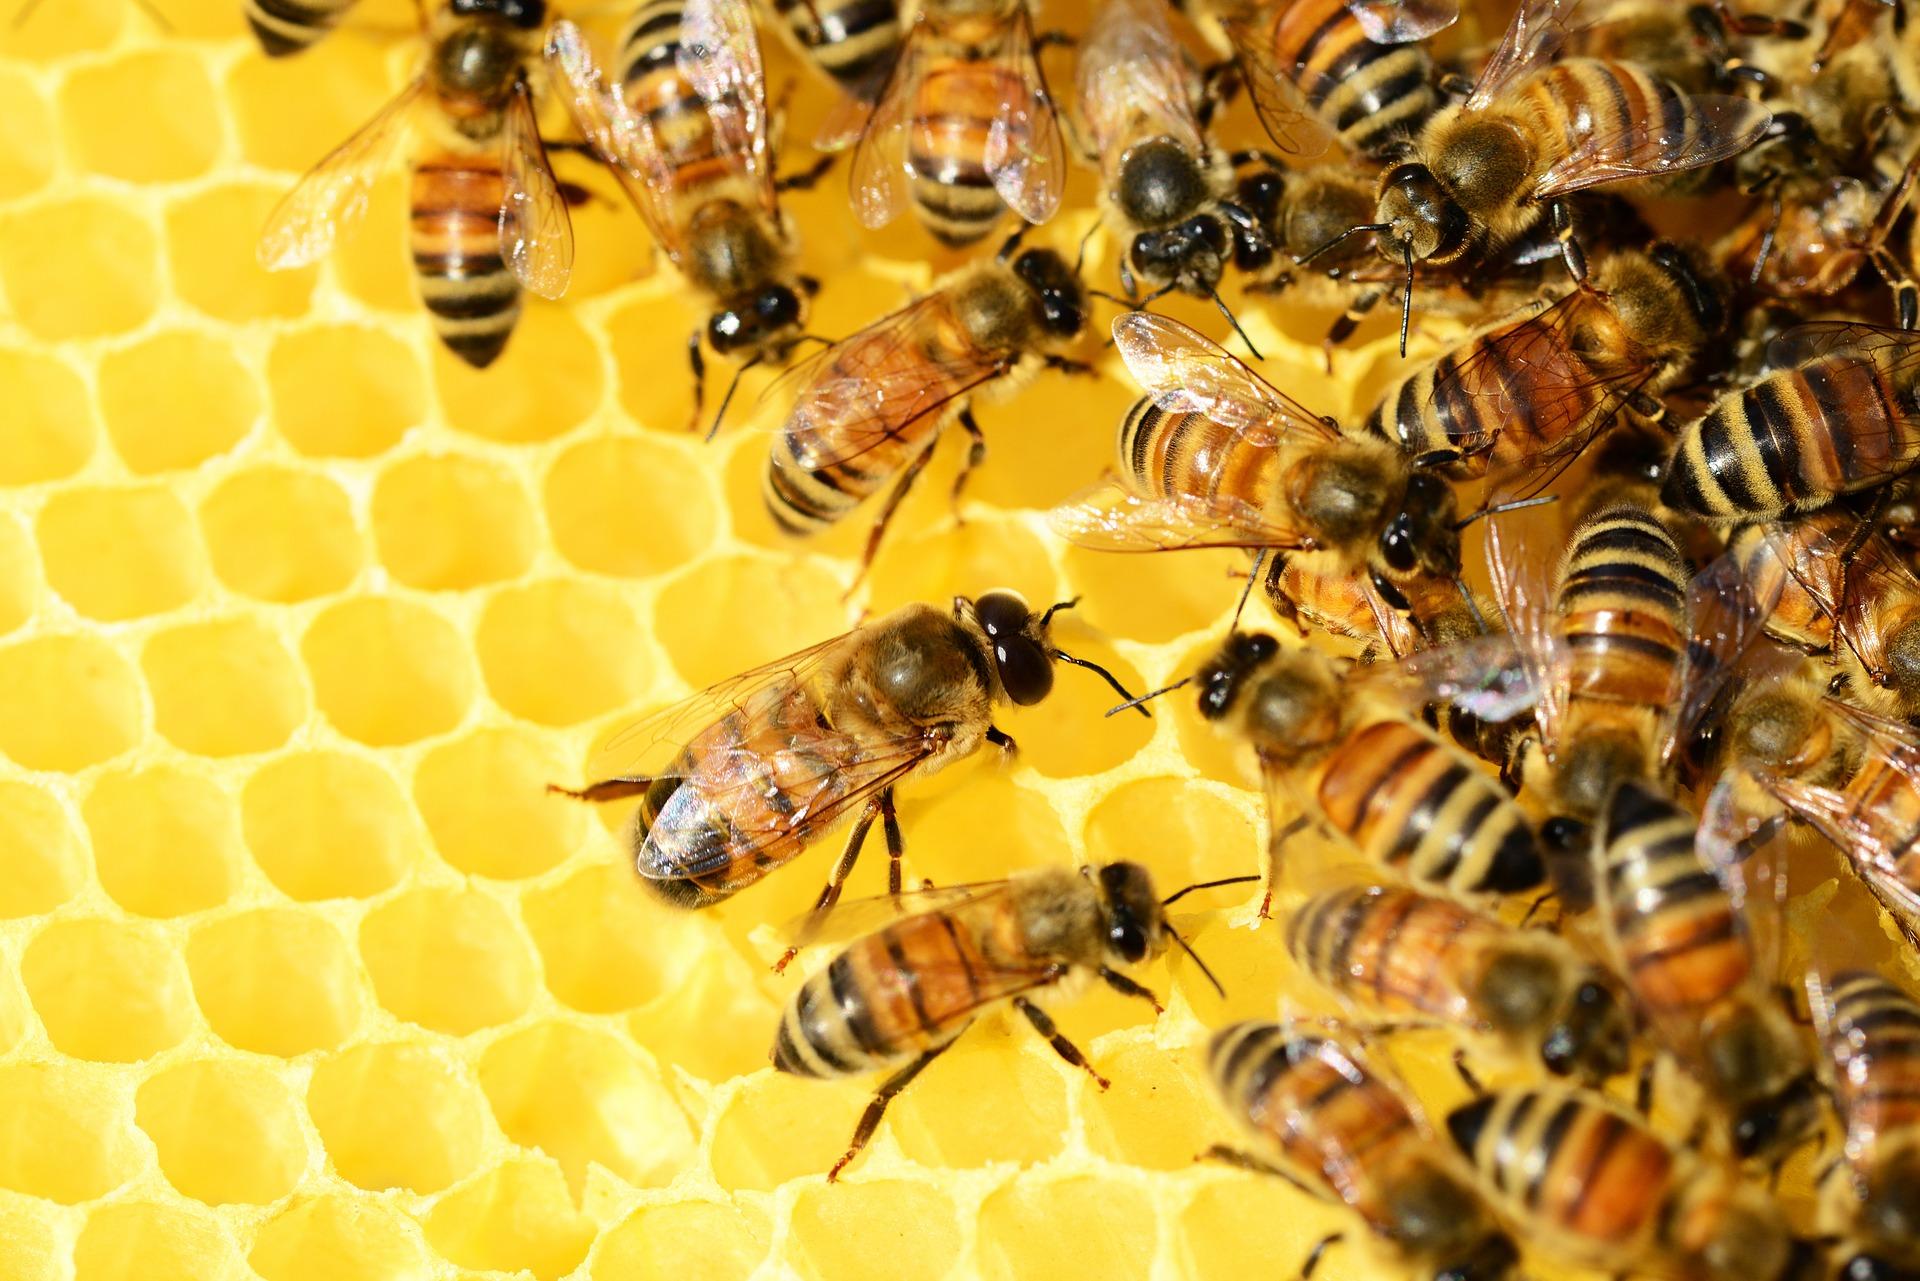 honey bees 326337 1920 - INTRO TO BEEKEEPING WORKSHOP